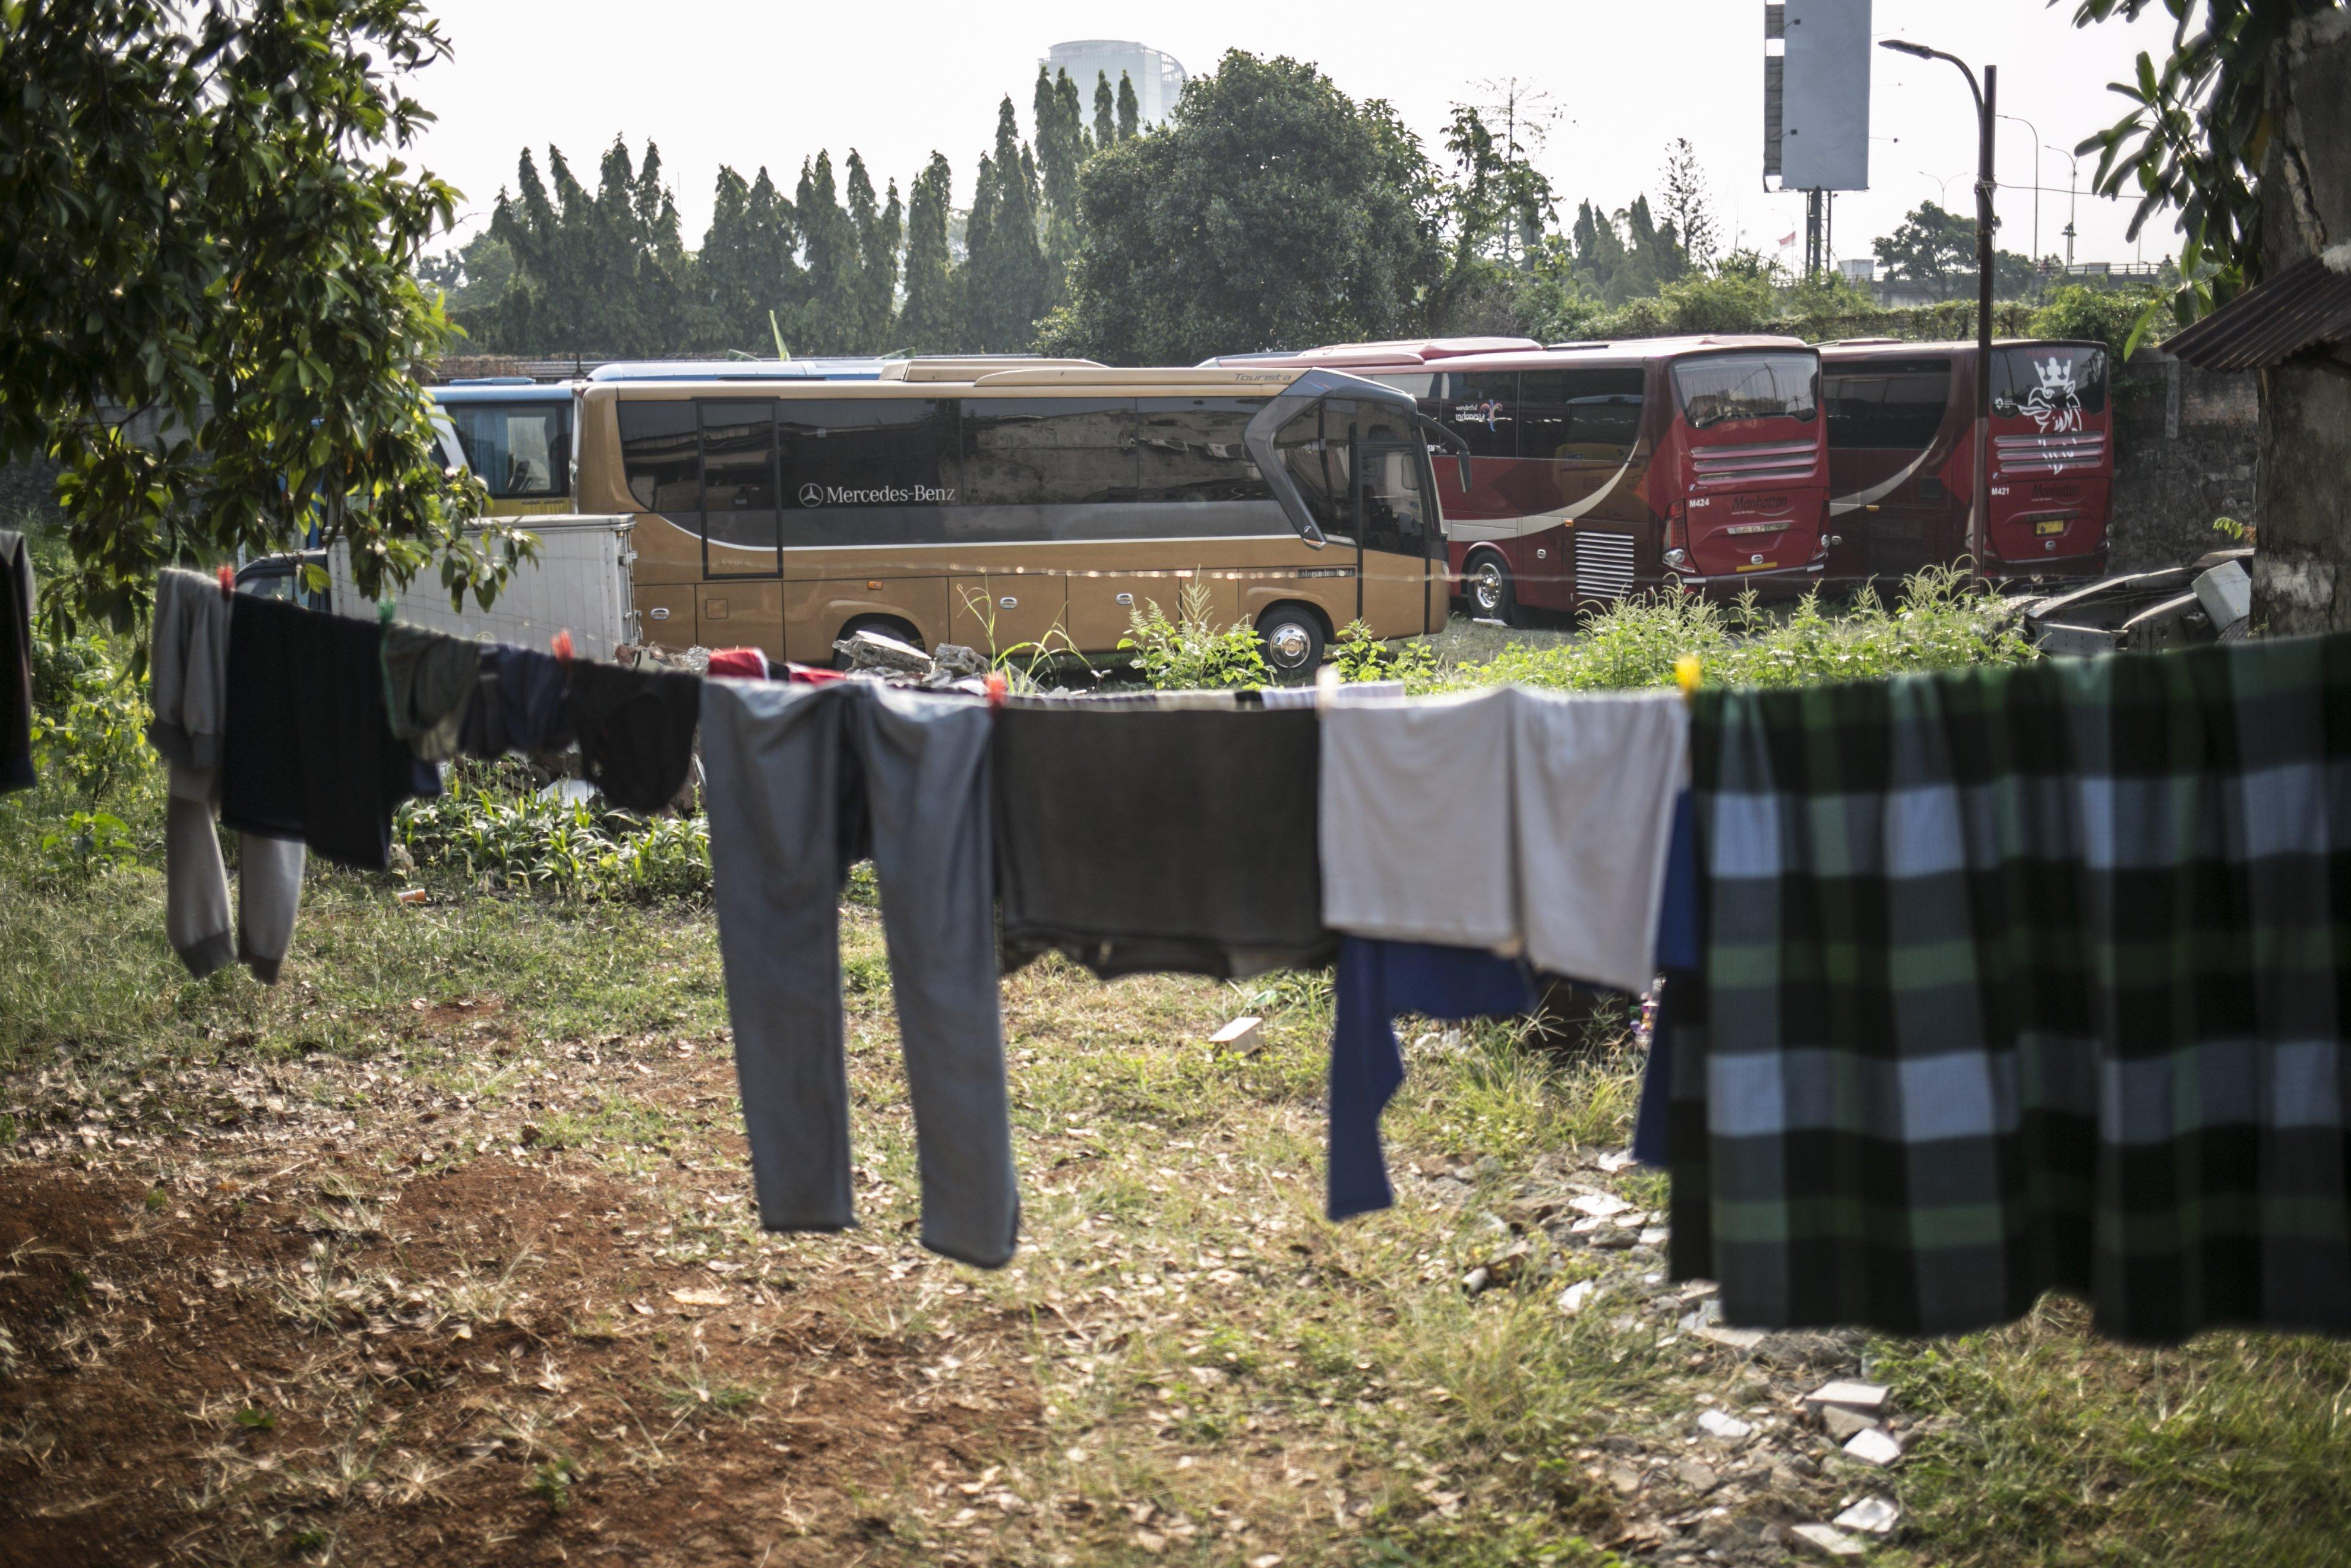 Sejumlah bus terparkir di salah satu pool bus pariwisata di kawasan Tanjung Barat, Jagakarsa, Jakarta, Selasa (28/7/2020). Masih diberlakukannya Pembatasan Sosial Bersekala Besar (PSBB) dan penutupan tempat rekreasi akibat Covid-19, berimbas pada jasa transportasi pariwisata. Sejak bulan Maret pengelola mengaku mengalami penurunan pendapatan dan penyewaan bus hingga 80%.